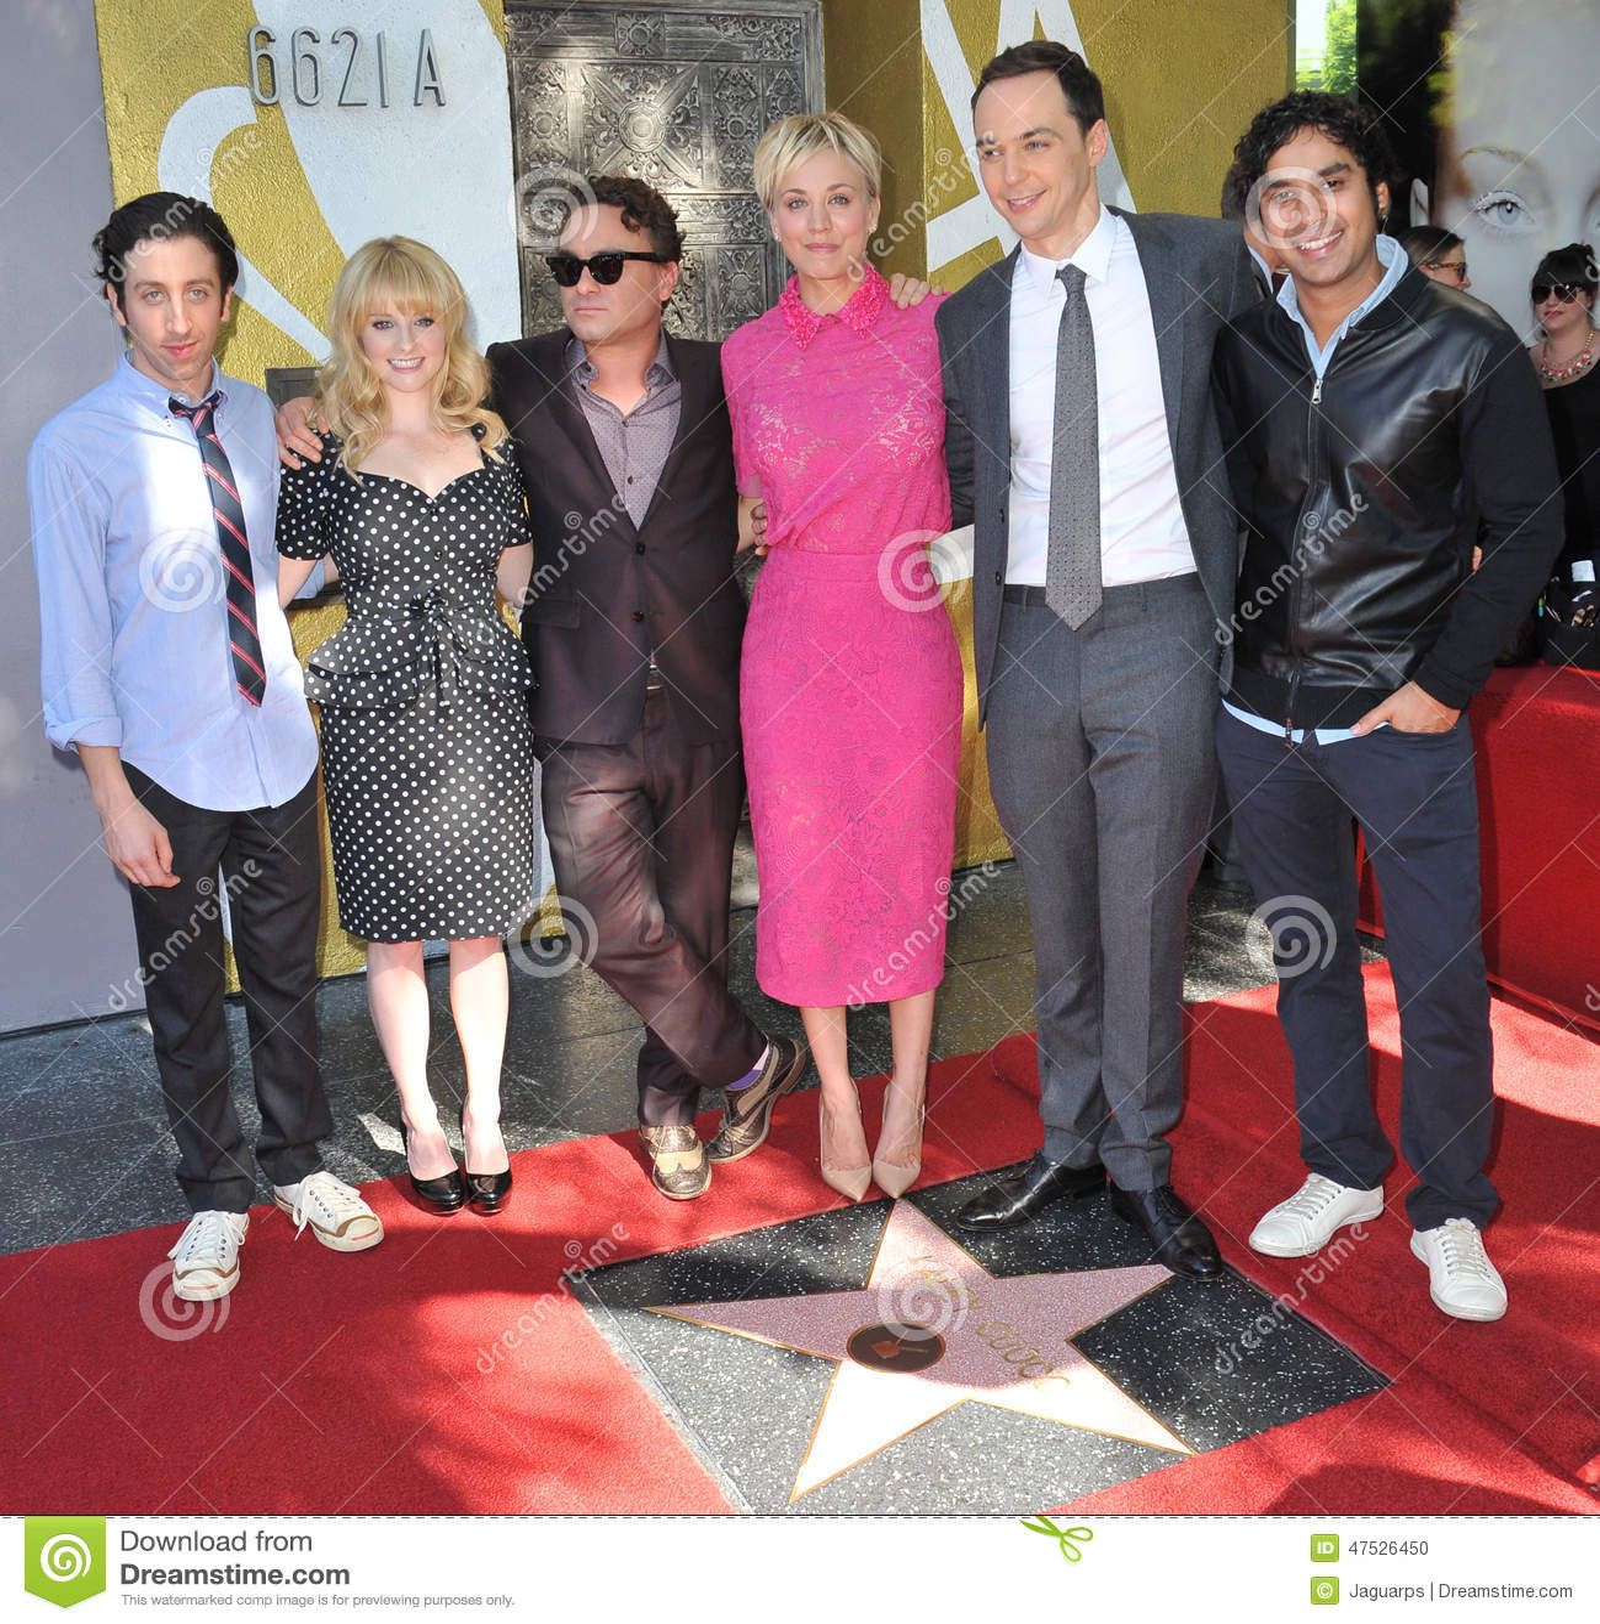 Kaley Cuoco Cast Of The Big Bang Theory Editorial Image Image Of